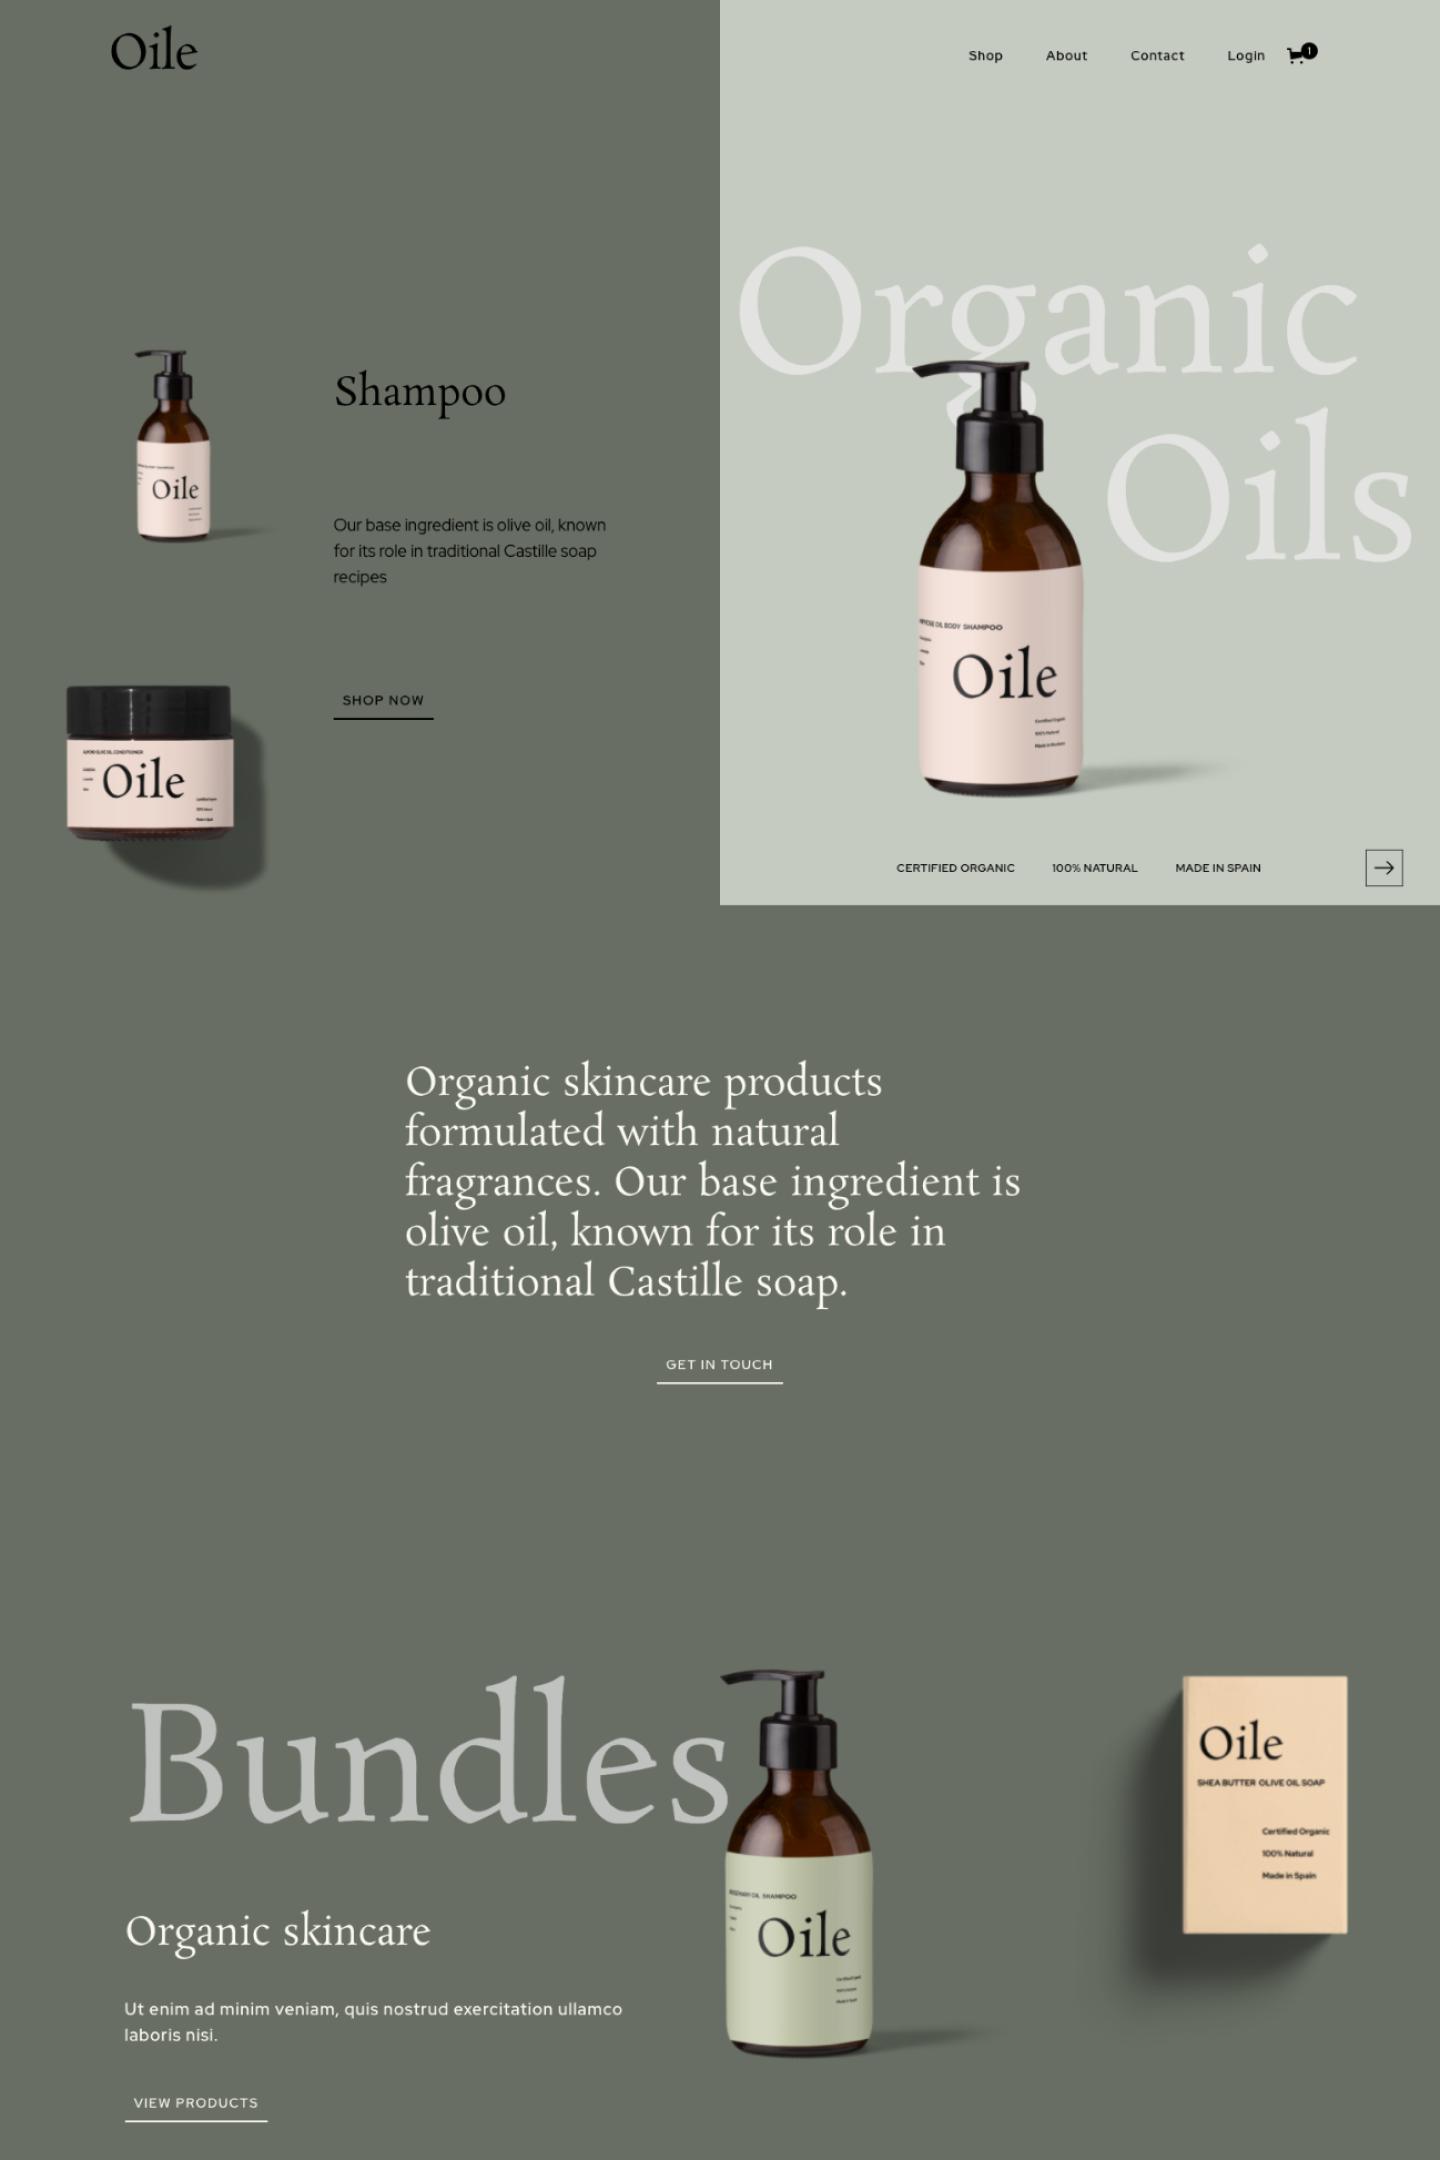 Oile Ecommerce by PLETORICA Designs